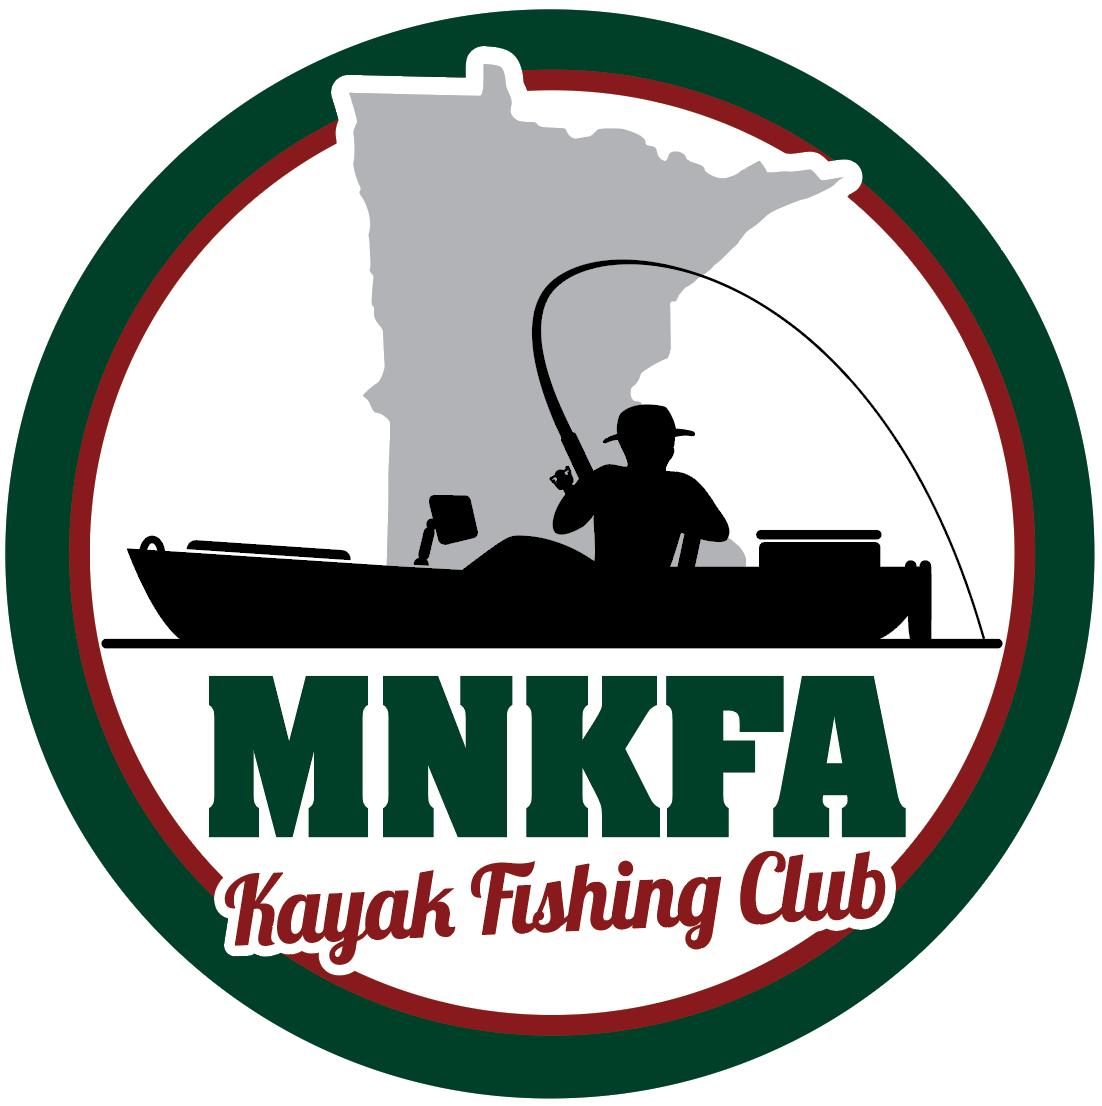 MNKFA Sticker 2021